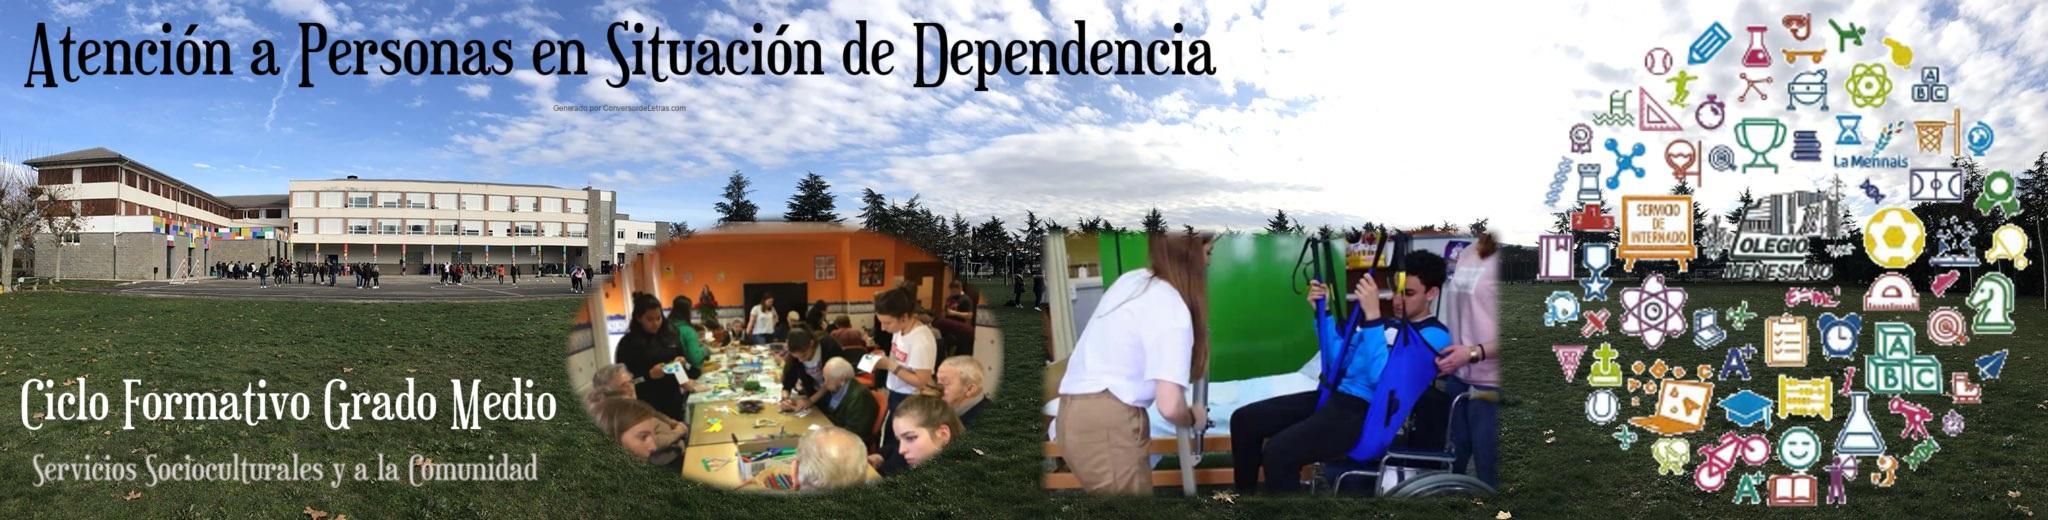 gm dependencia1